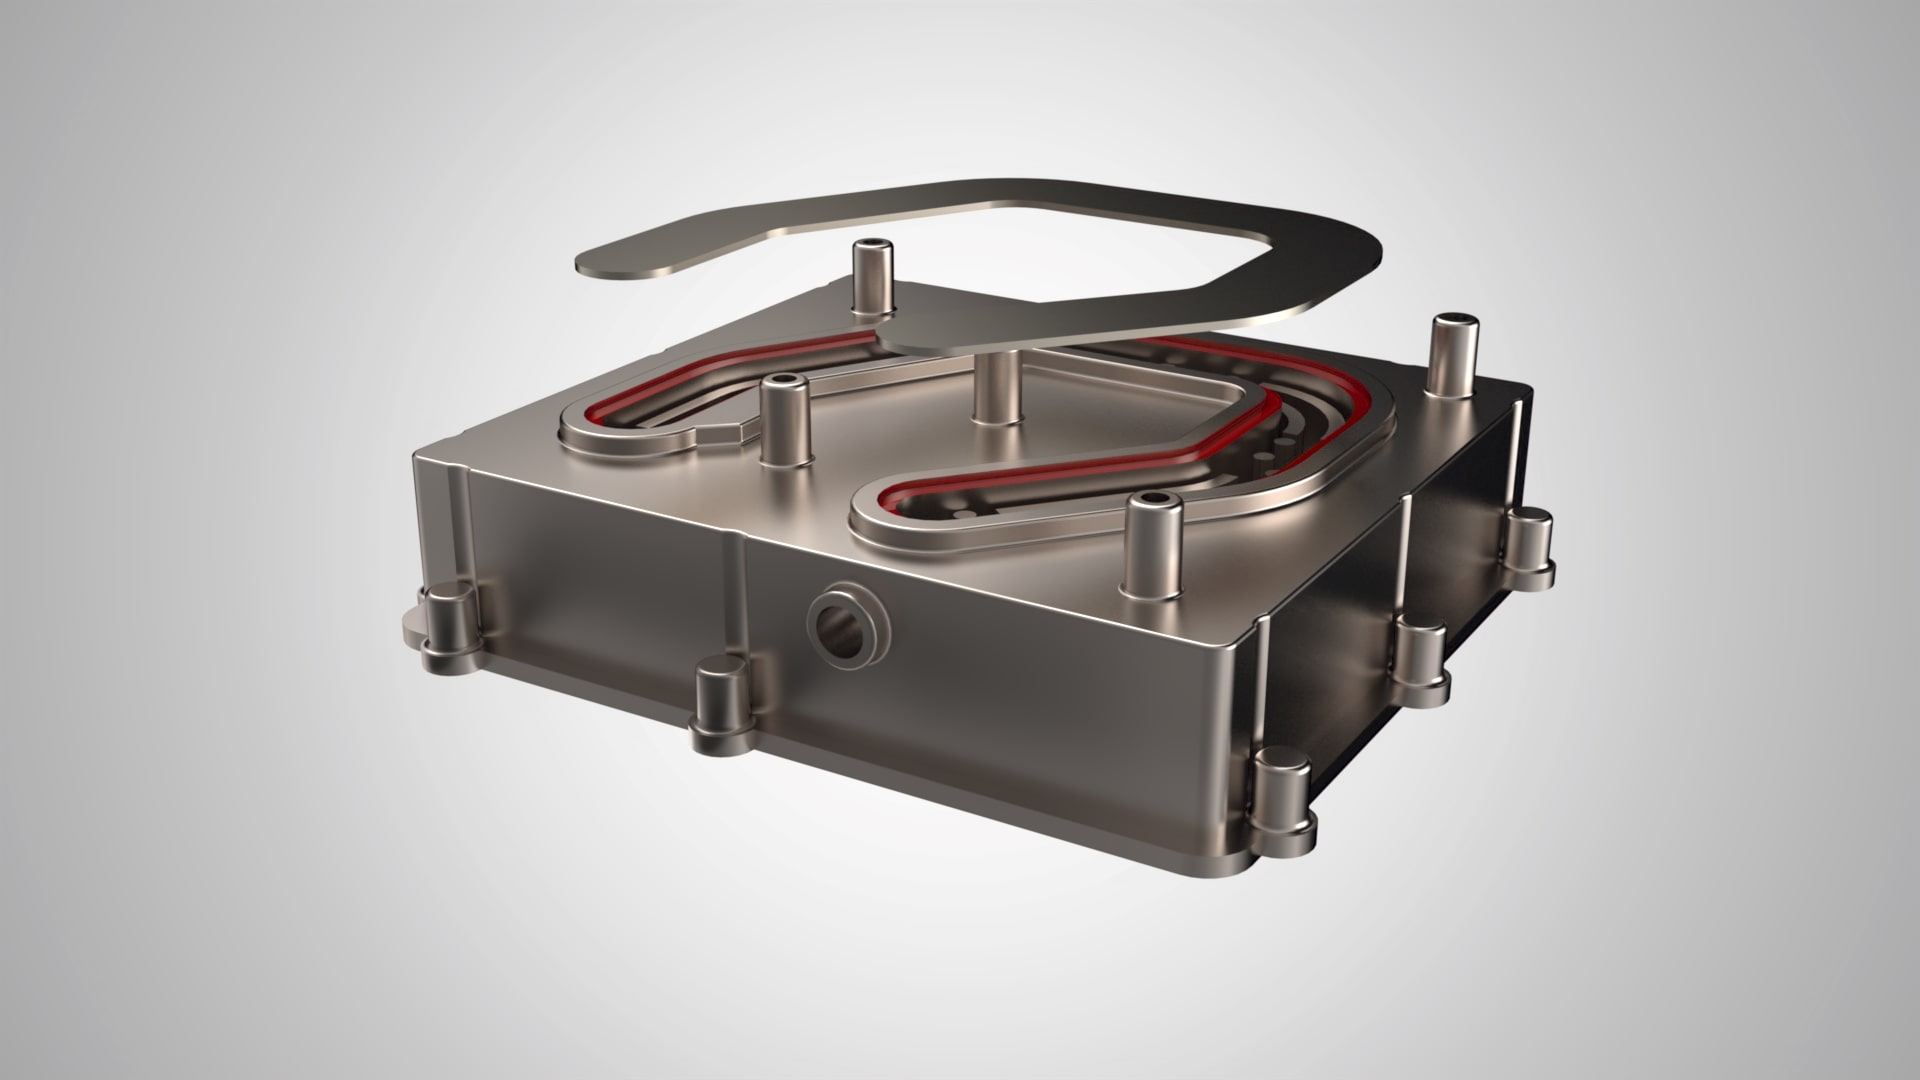 Heat sink parts before FSW